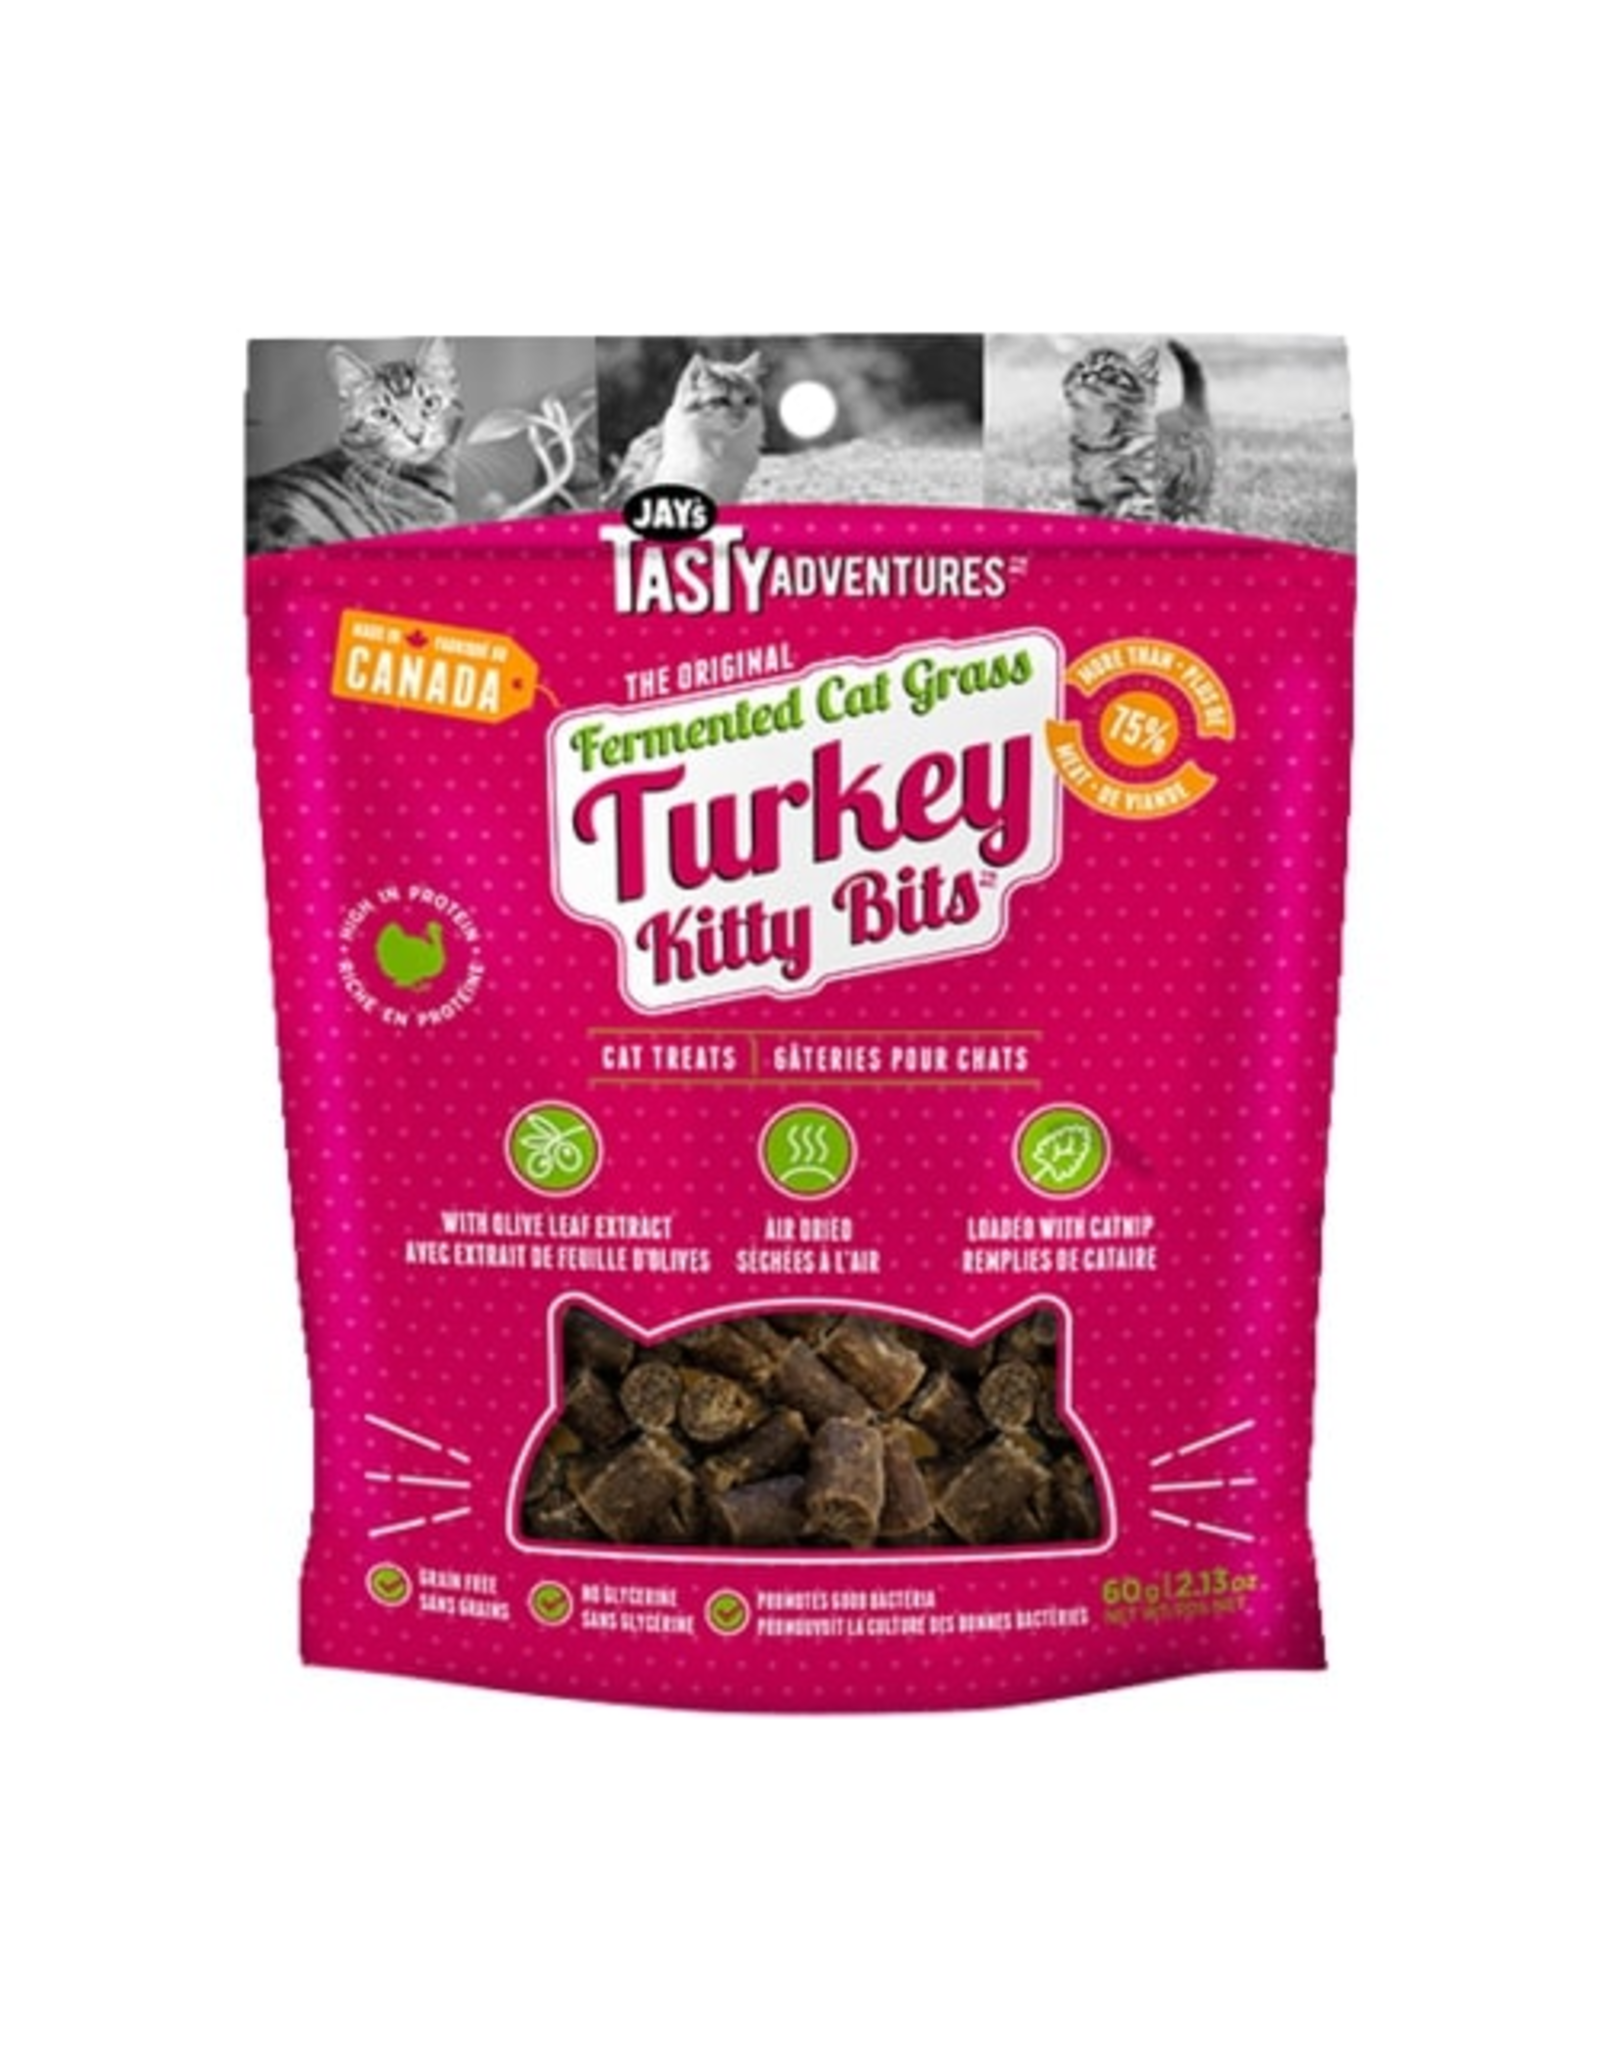 Jay's Tasty Adventures Jays Fermented Cat Grass Turkey Cat Treats 60g